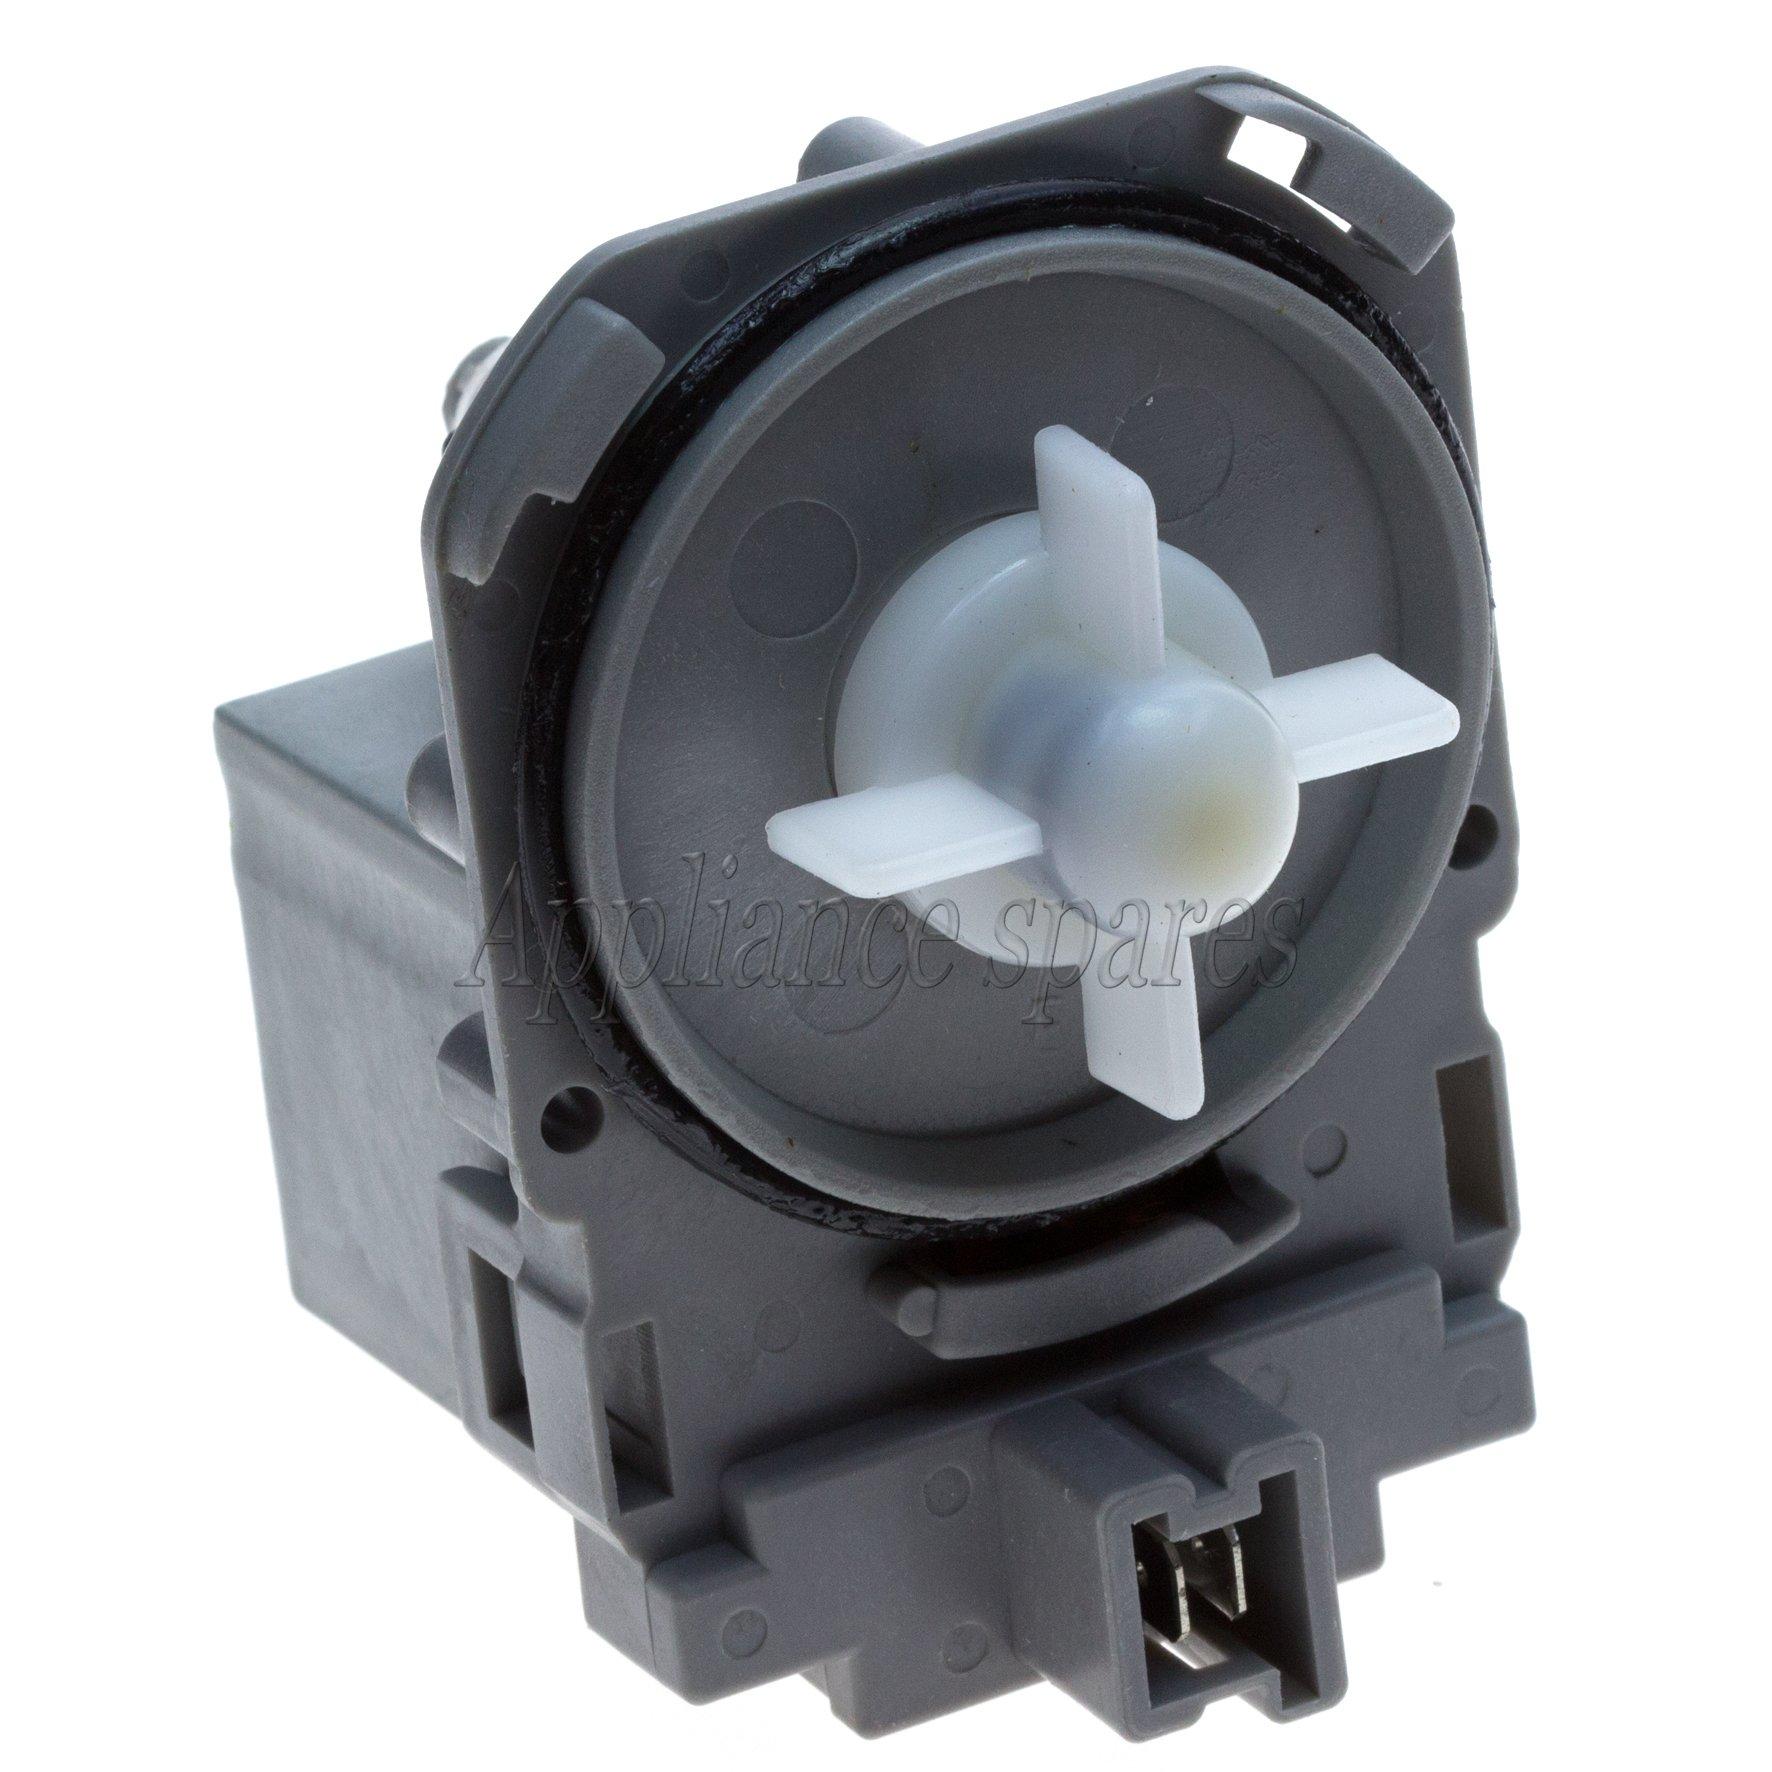 Askoll Original Pump for Bosch Constructa Neff Siemens Washing Machine Part for 142370 M50 M54 M50.1 M54.1 M215